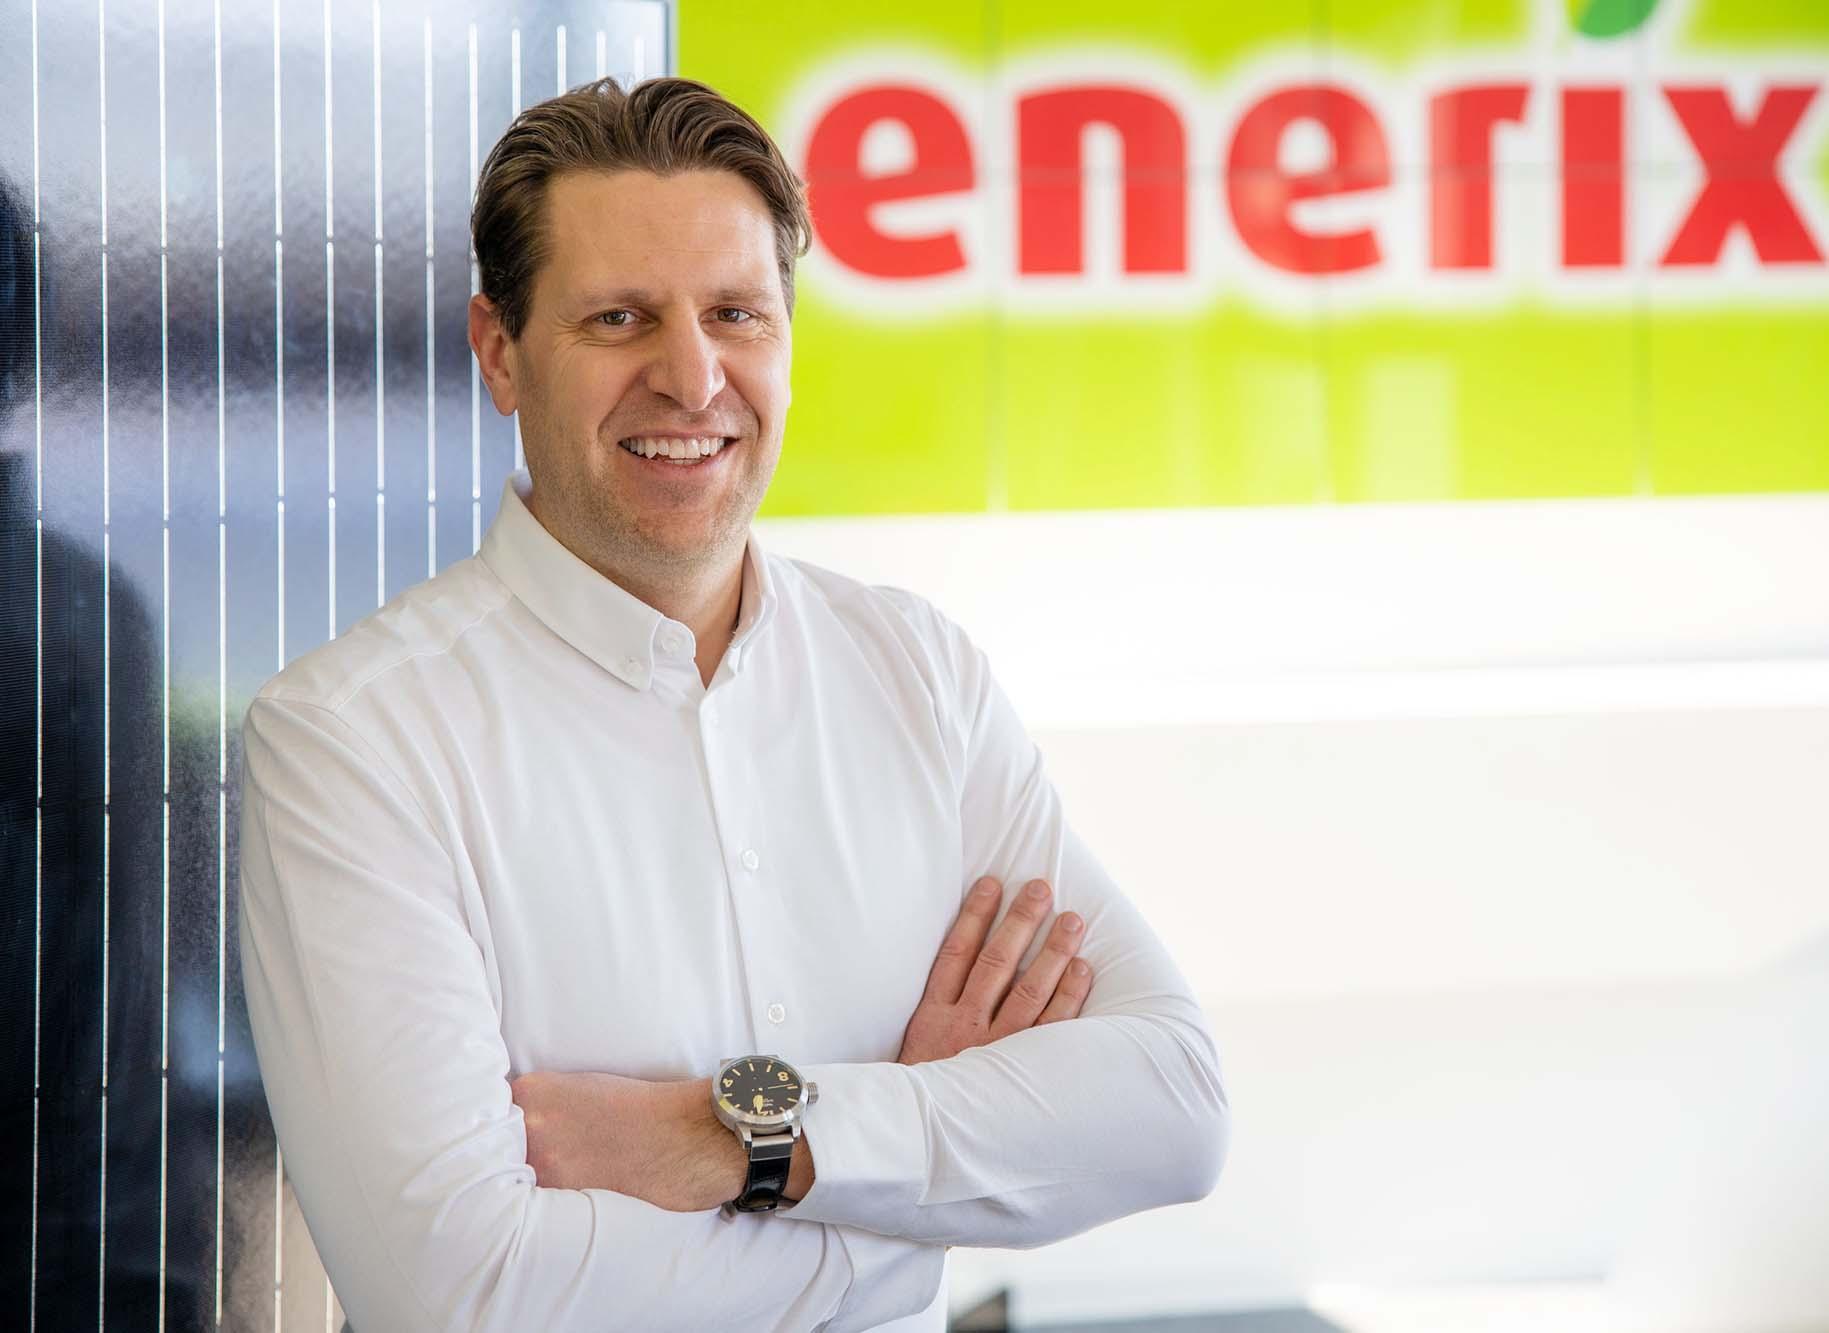 2021-6-9-OG-Unternehmen-enerix_FP_PaulHaas_02